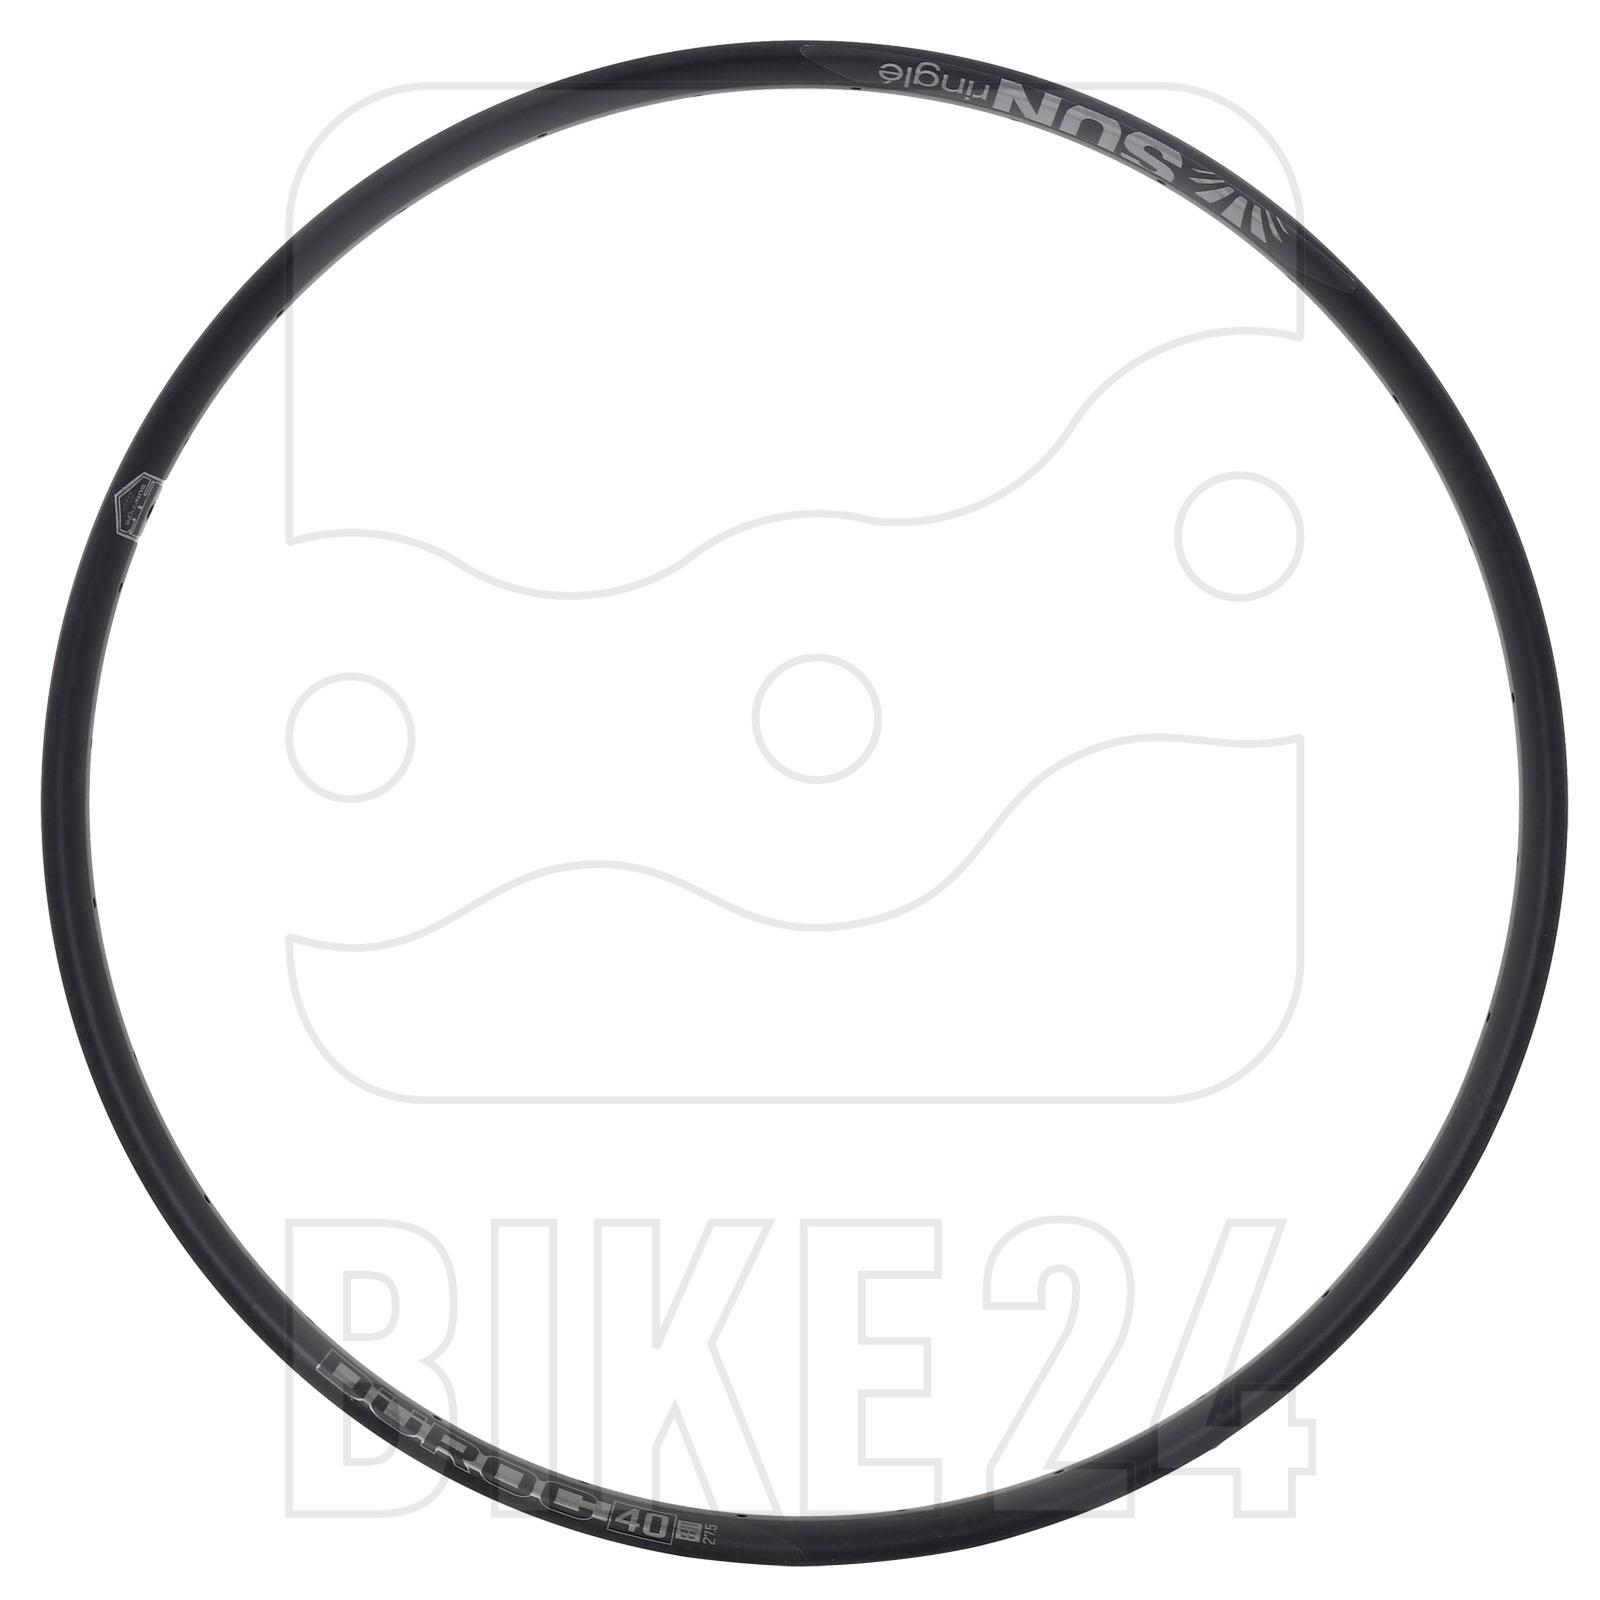 SUNringlé Düroc 40 Disc 29 Inch MTB Rim - black